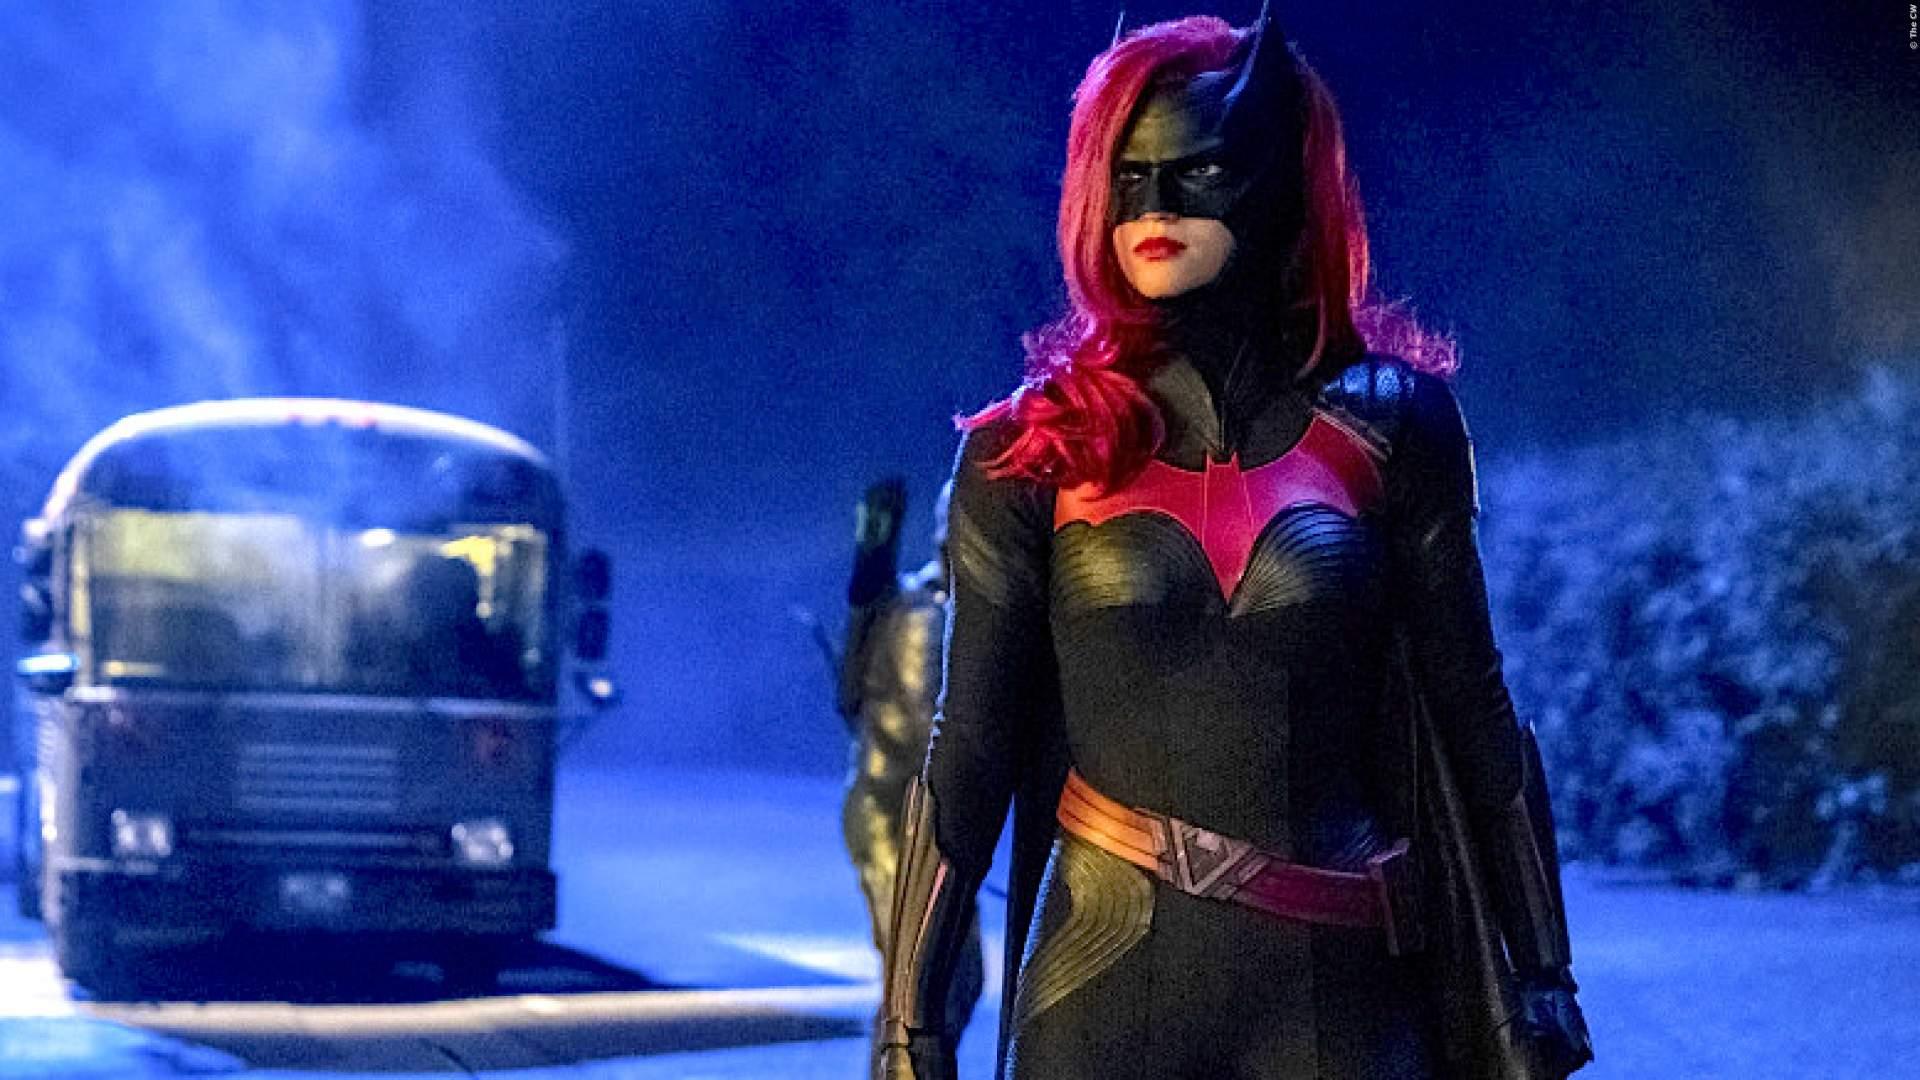 BATGIRL: Kinofilm zur DC-Superheldin hat Prio 1 in Hollywood